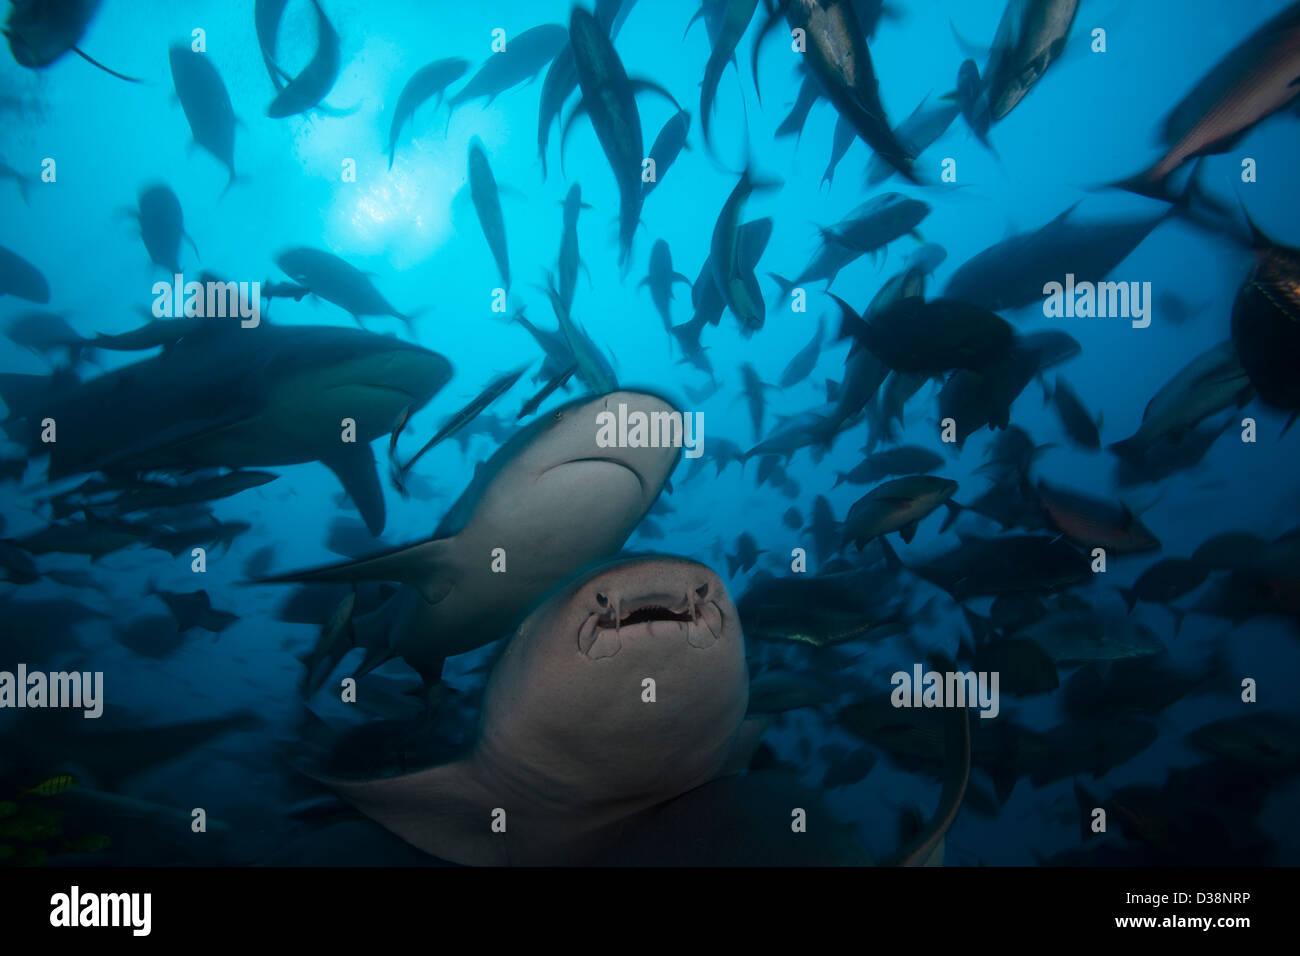 Bull sharks hunting in school of fish - Stock Image